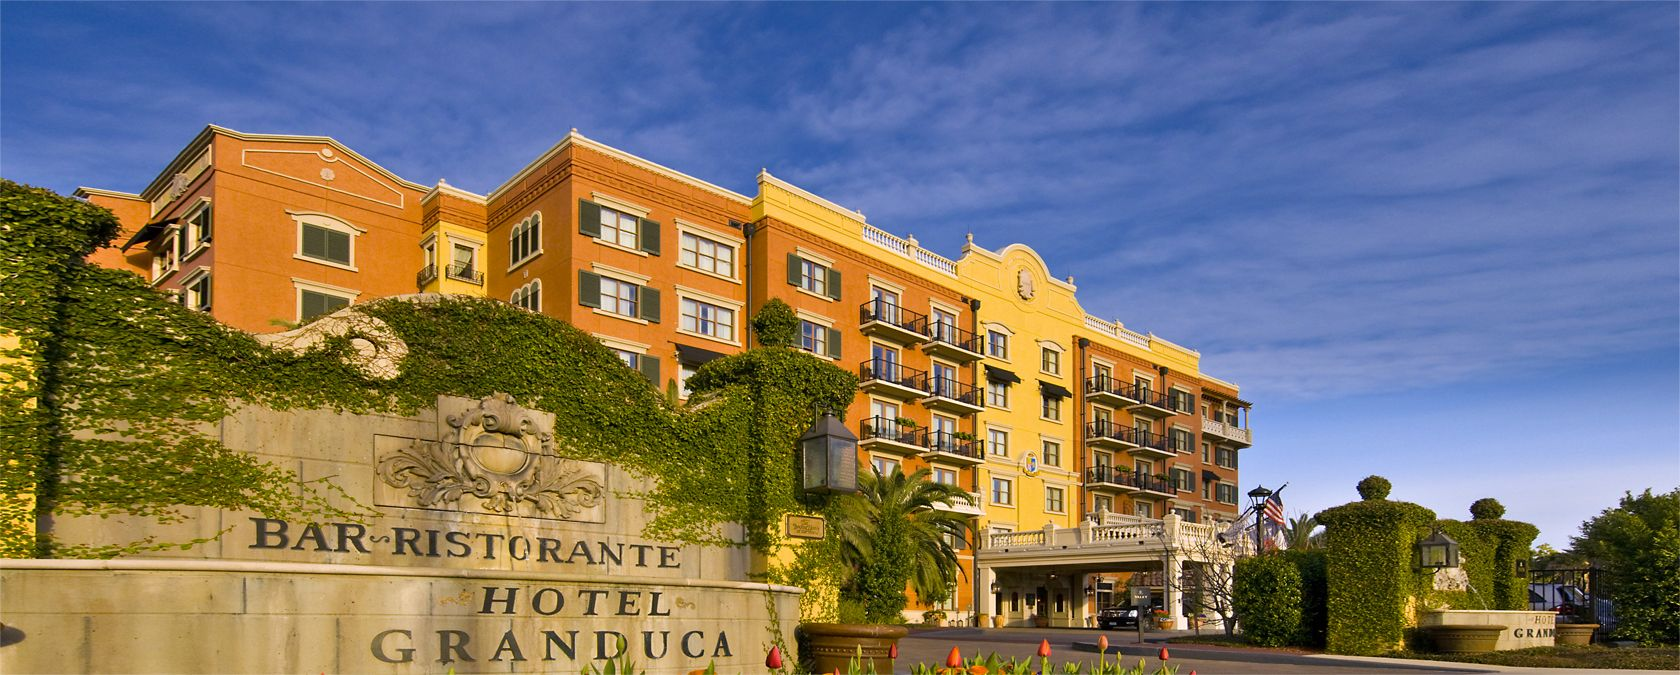 Luxury Houston Hotels Hotel Granduca Houston Tx Hotels To